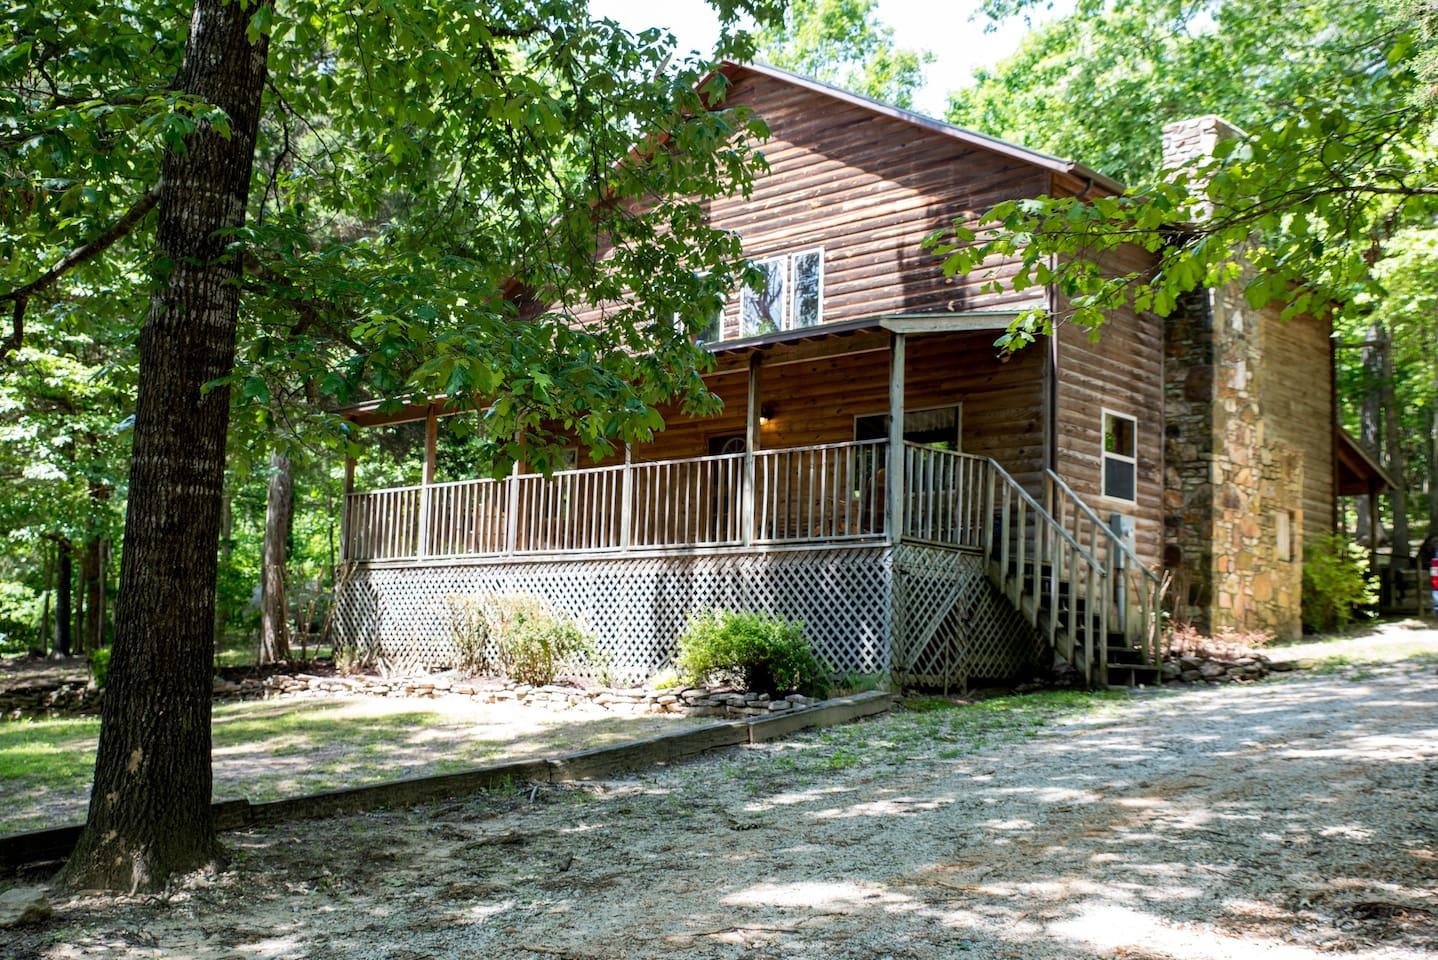 buffalo farmhouse efbb located arkansas centrally river cabins rental jasper cabin